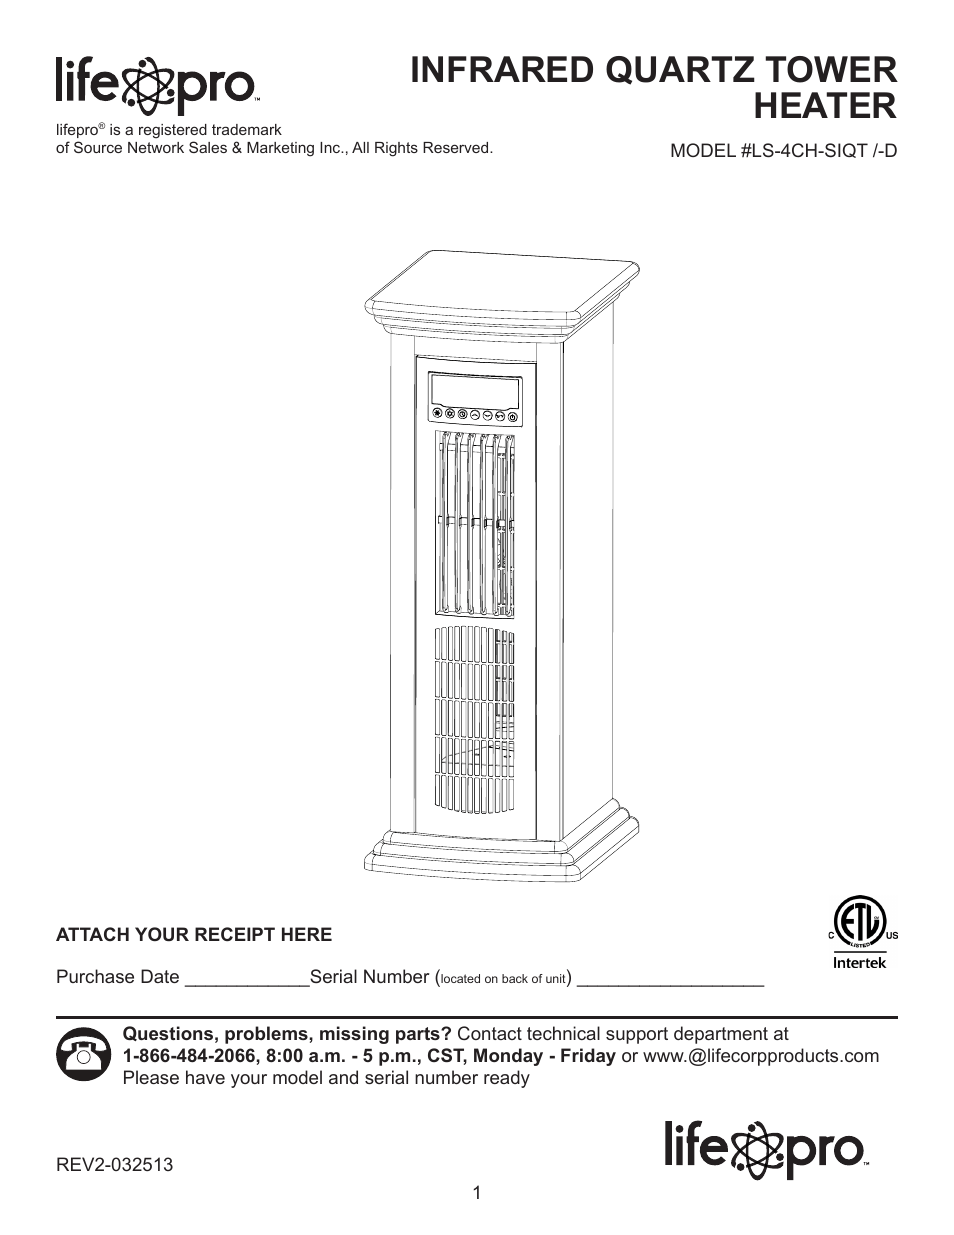 medium resolution of lifesmart infrared heater wiring diagram western star edenpure 1000 wiring diagram quartz tube heater